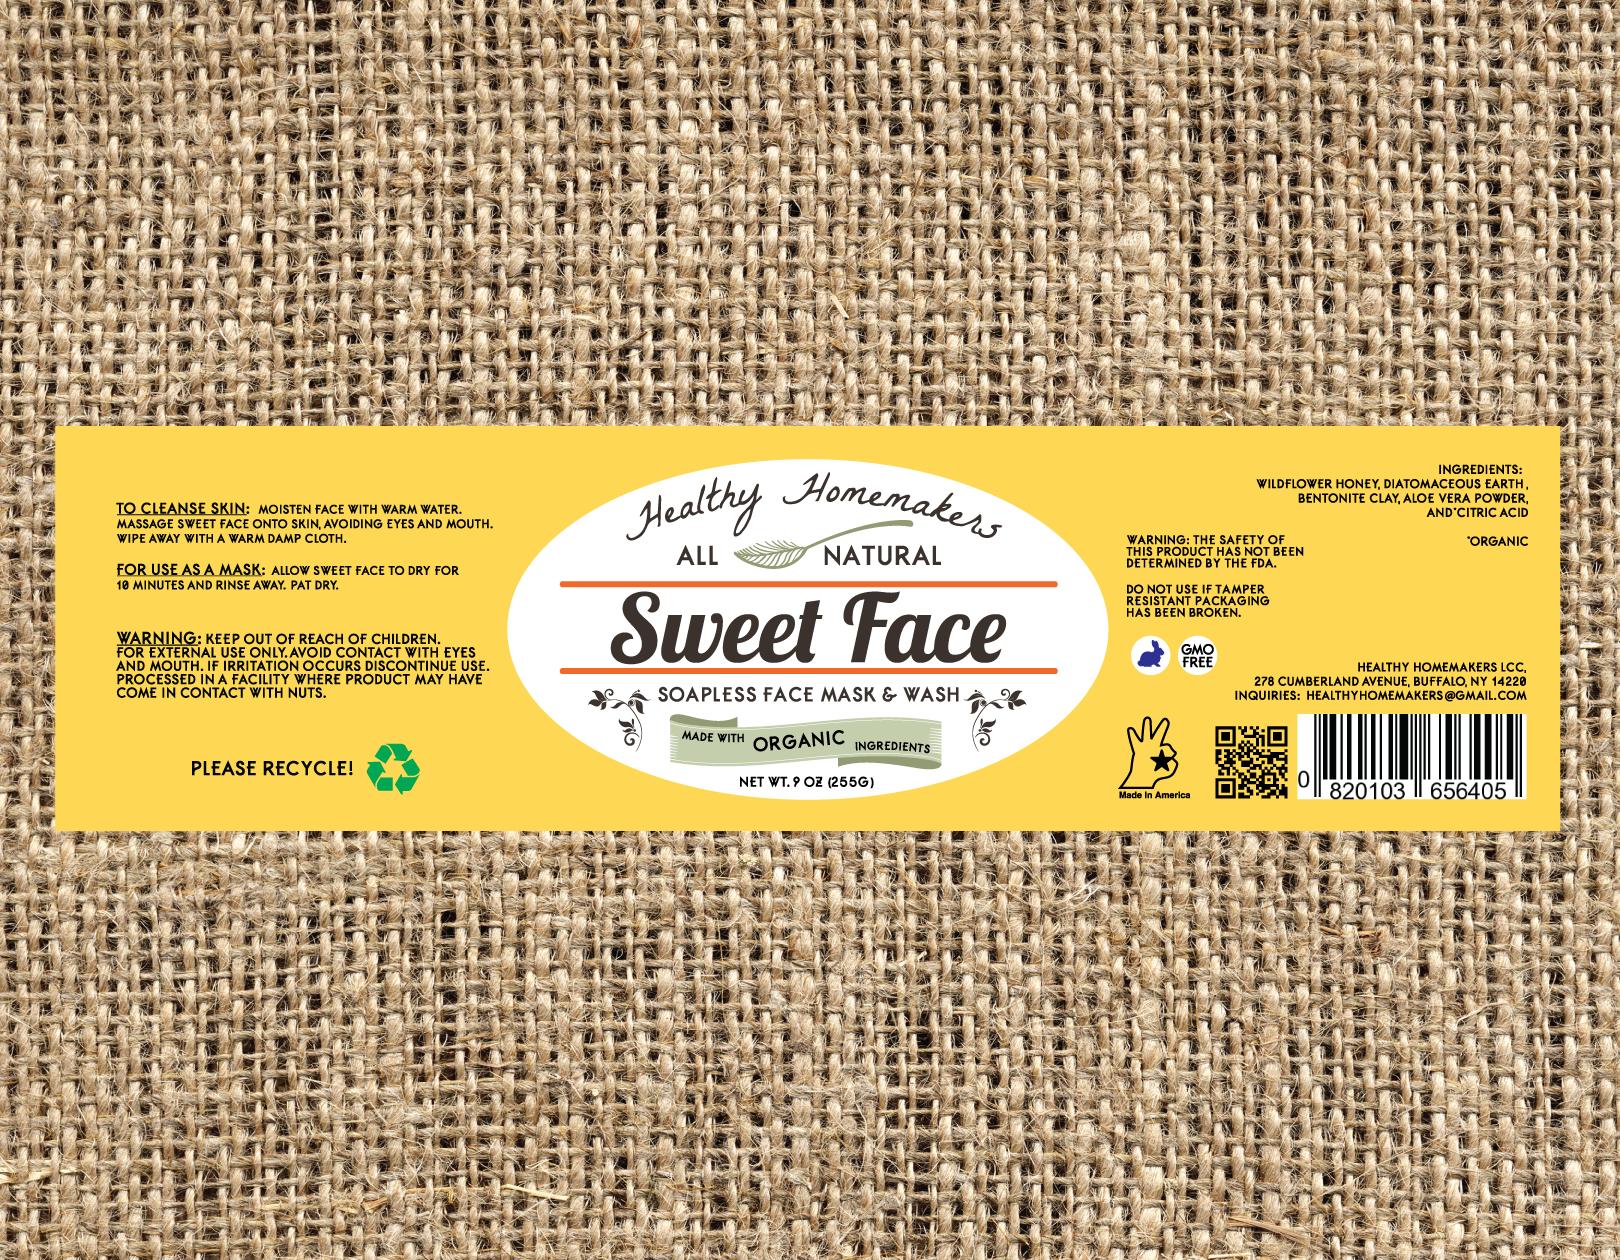 Sweet Face - 9oz